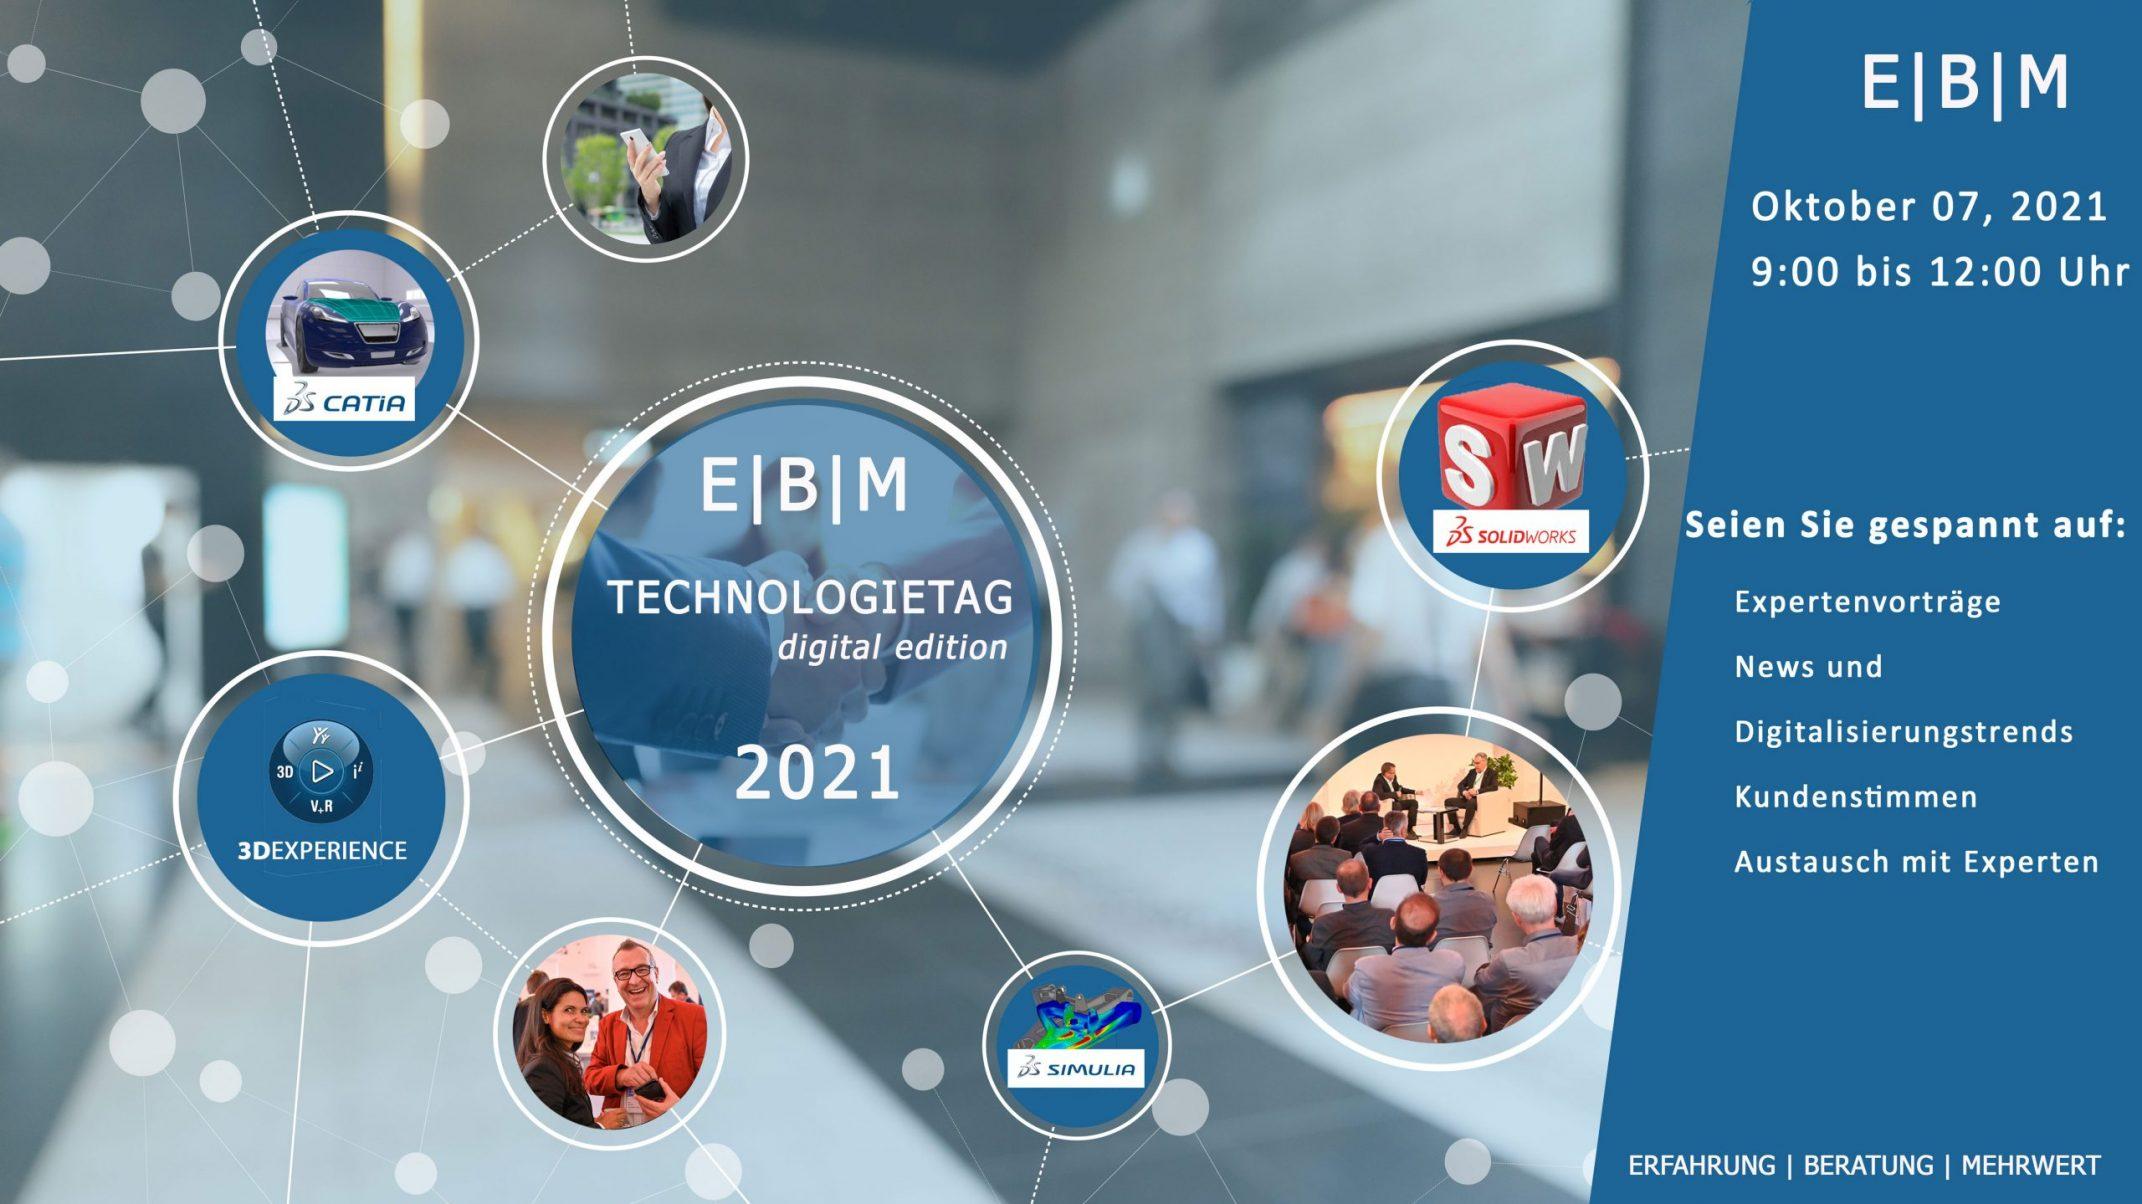 EBM Technologietag 2021